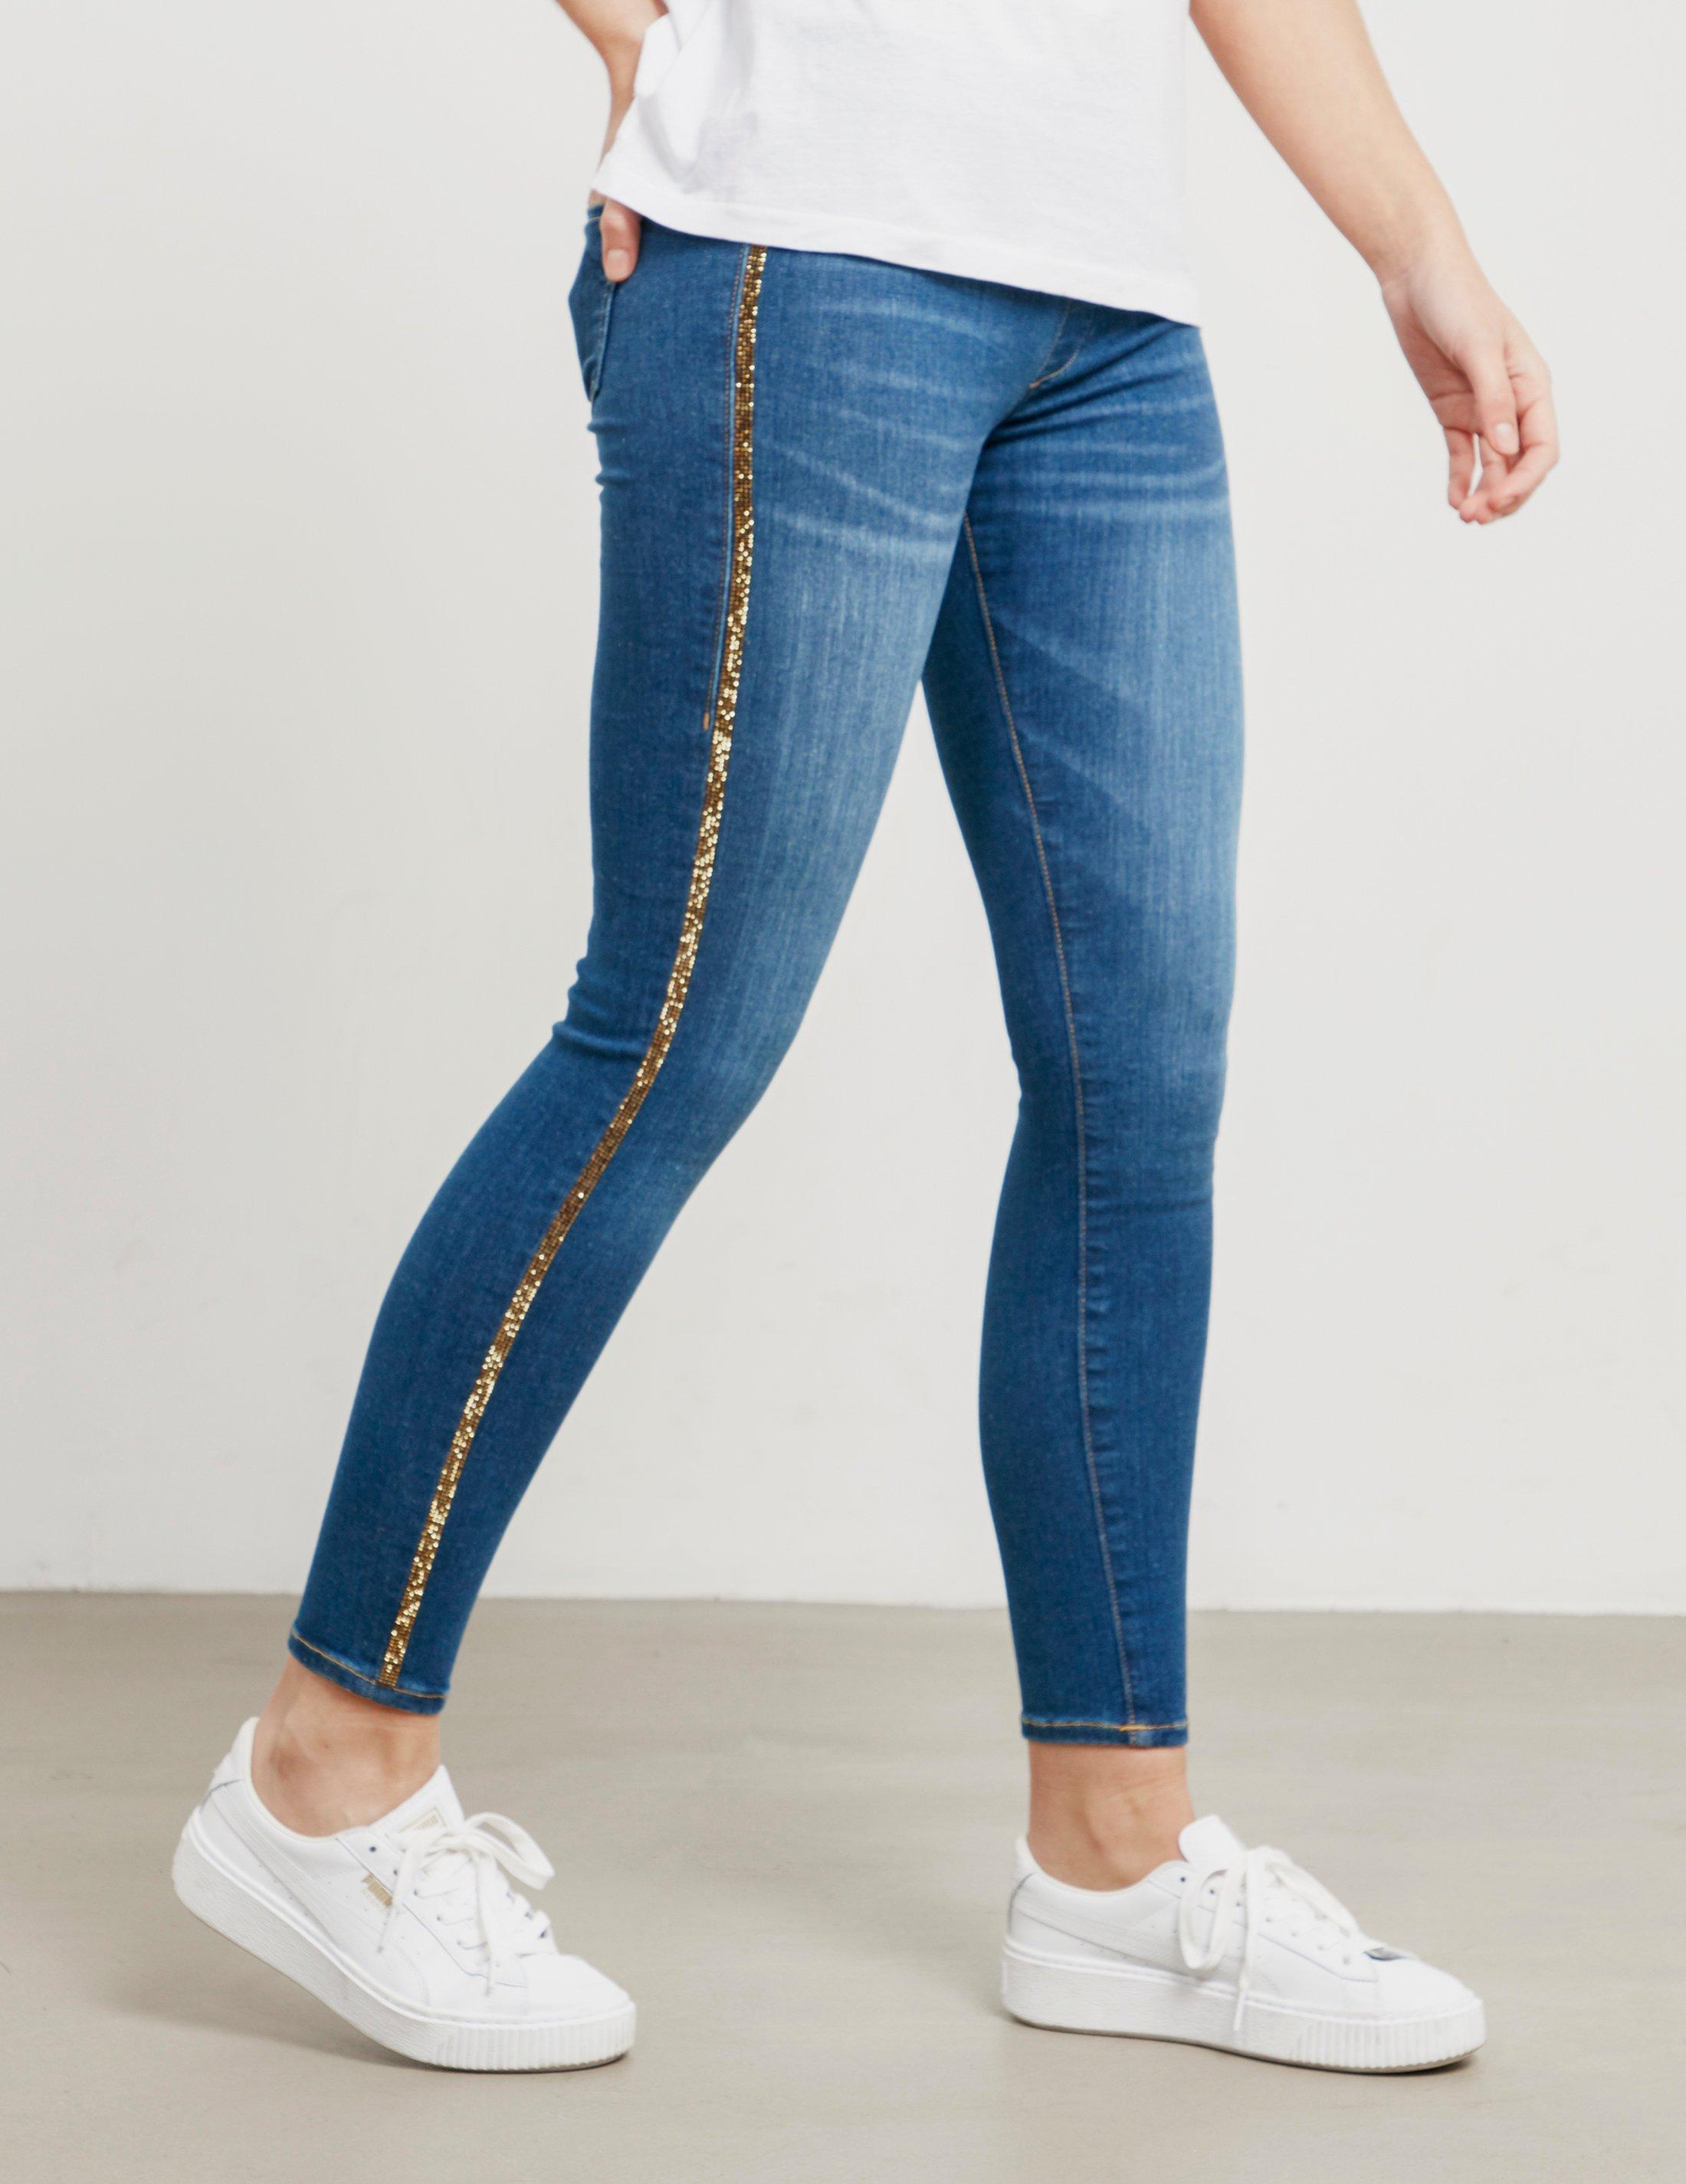 df0ee1c73 Lyst - True Religion Womens Rhinestone Skinny Runway Leggings Blue ...